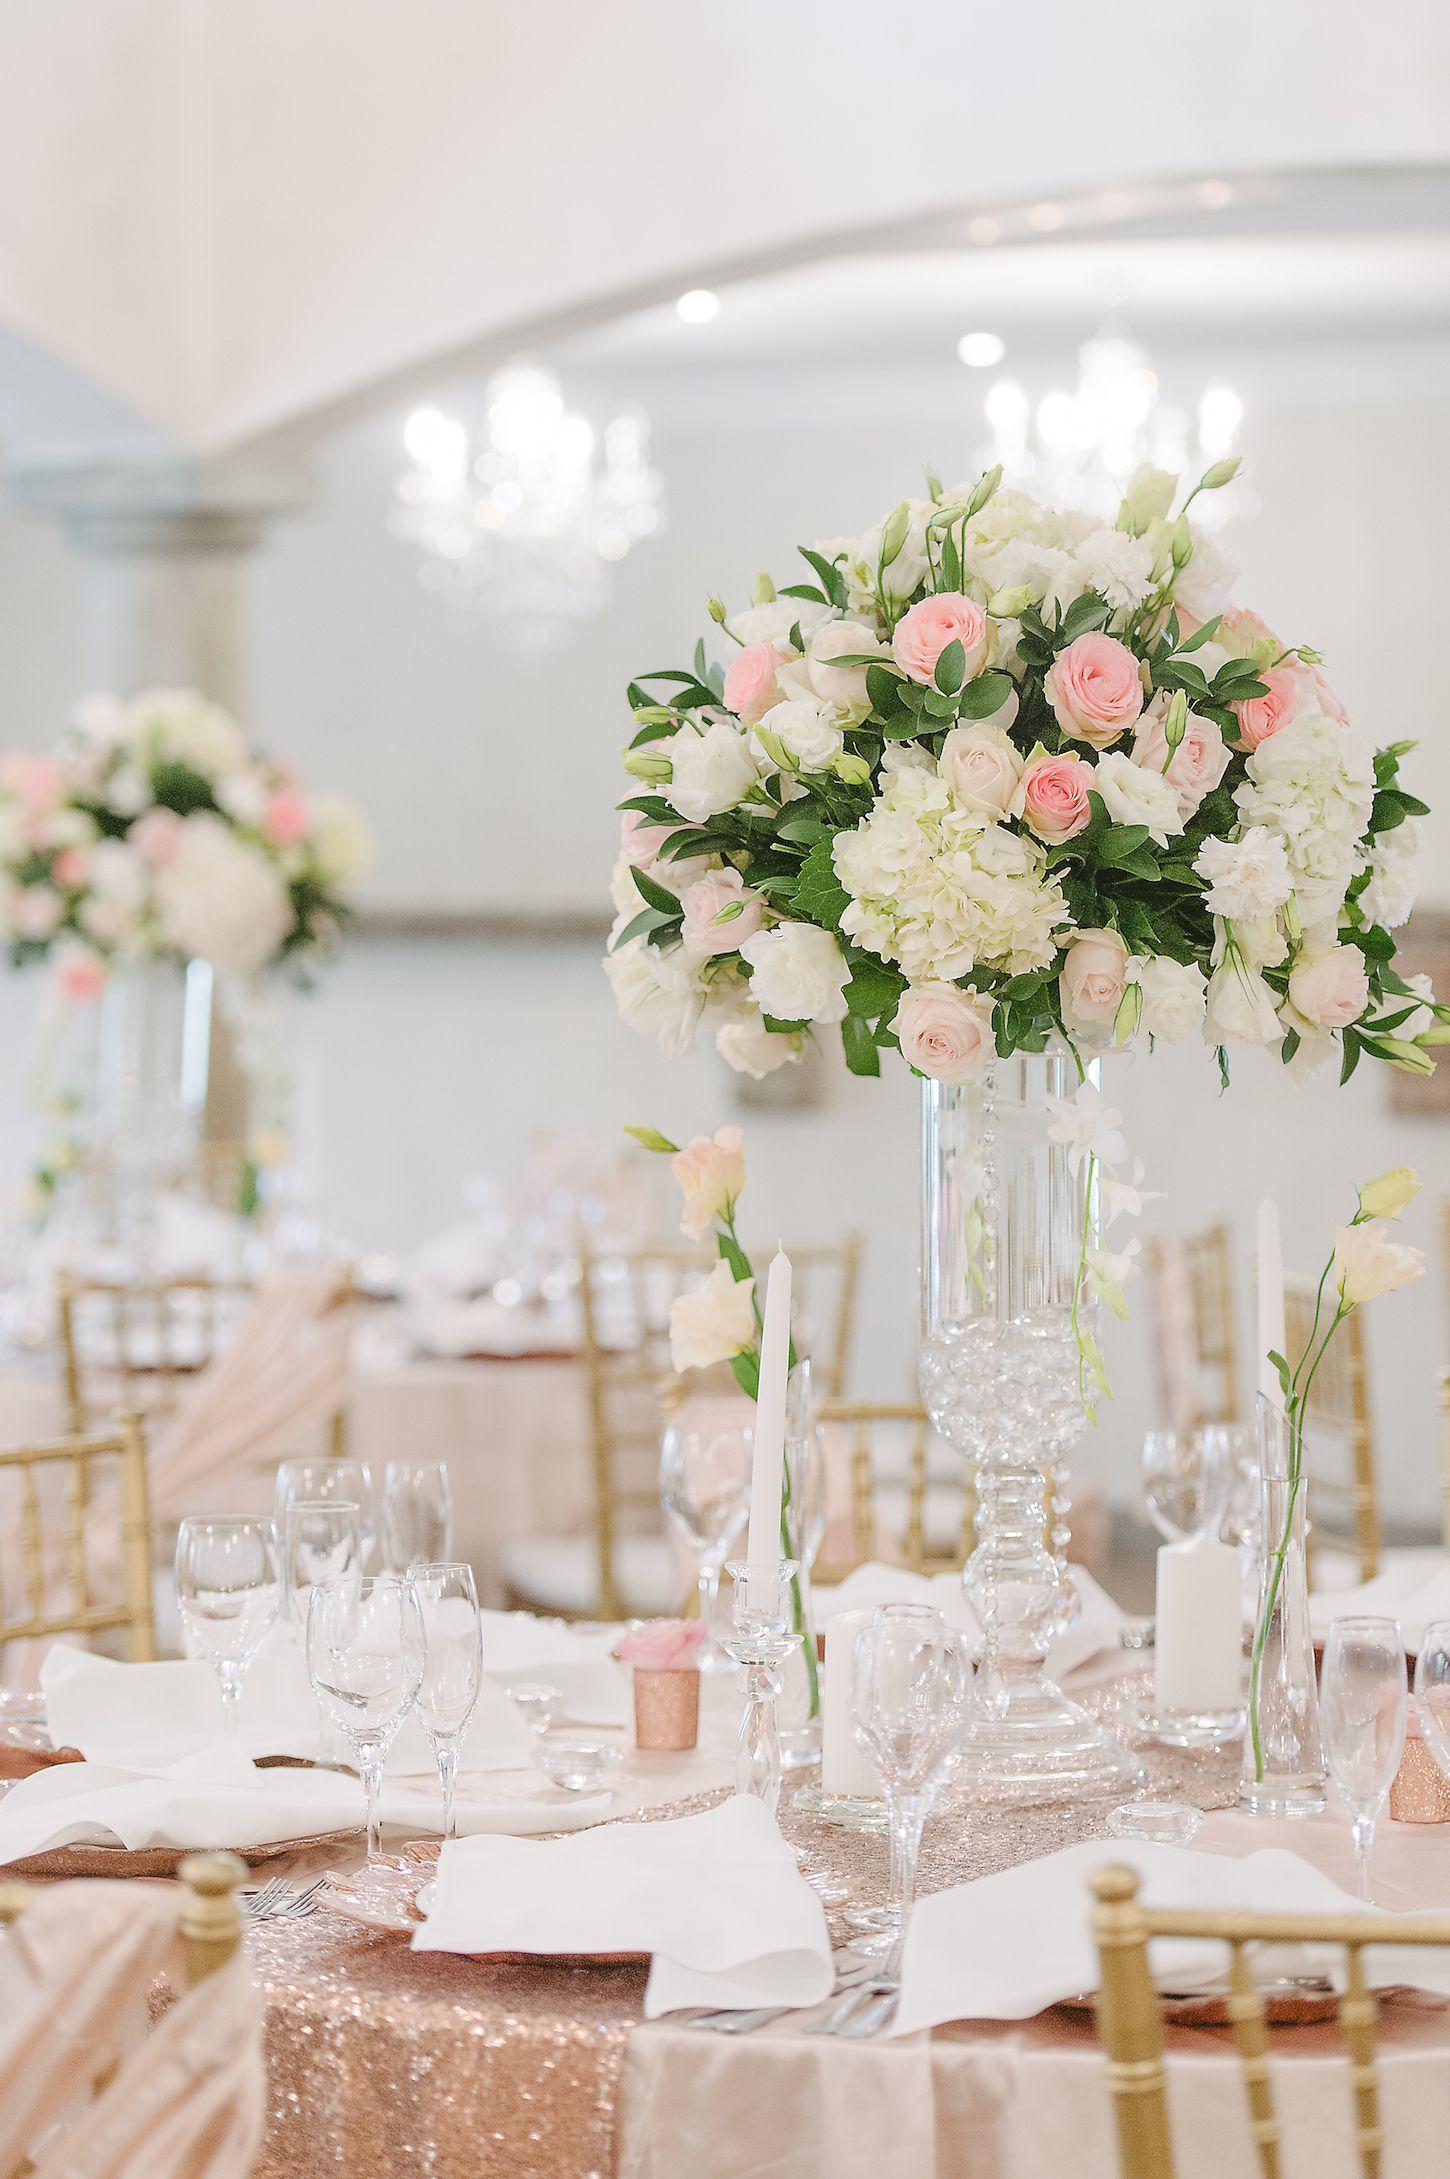 romantic and lush white and blush pink flower centerpieces using rh pinterest com Centerpiece Hydrangea Peoli Rose Blush Pink Flowers Blush Pink Hydrangea Wedding Bouquet